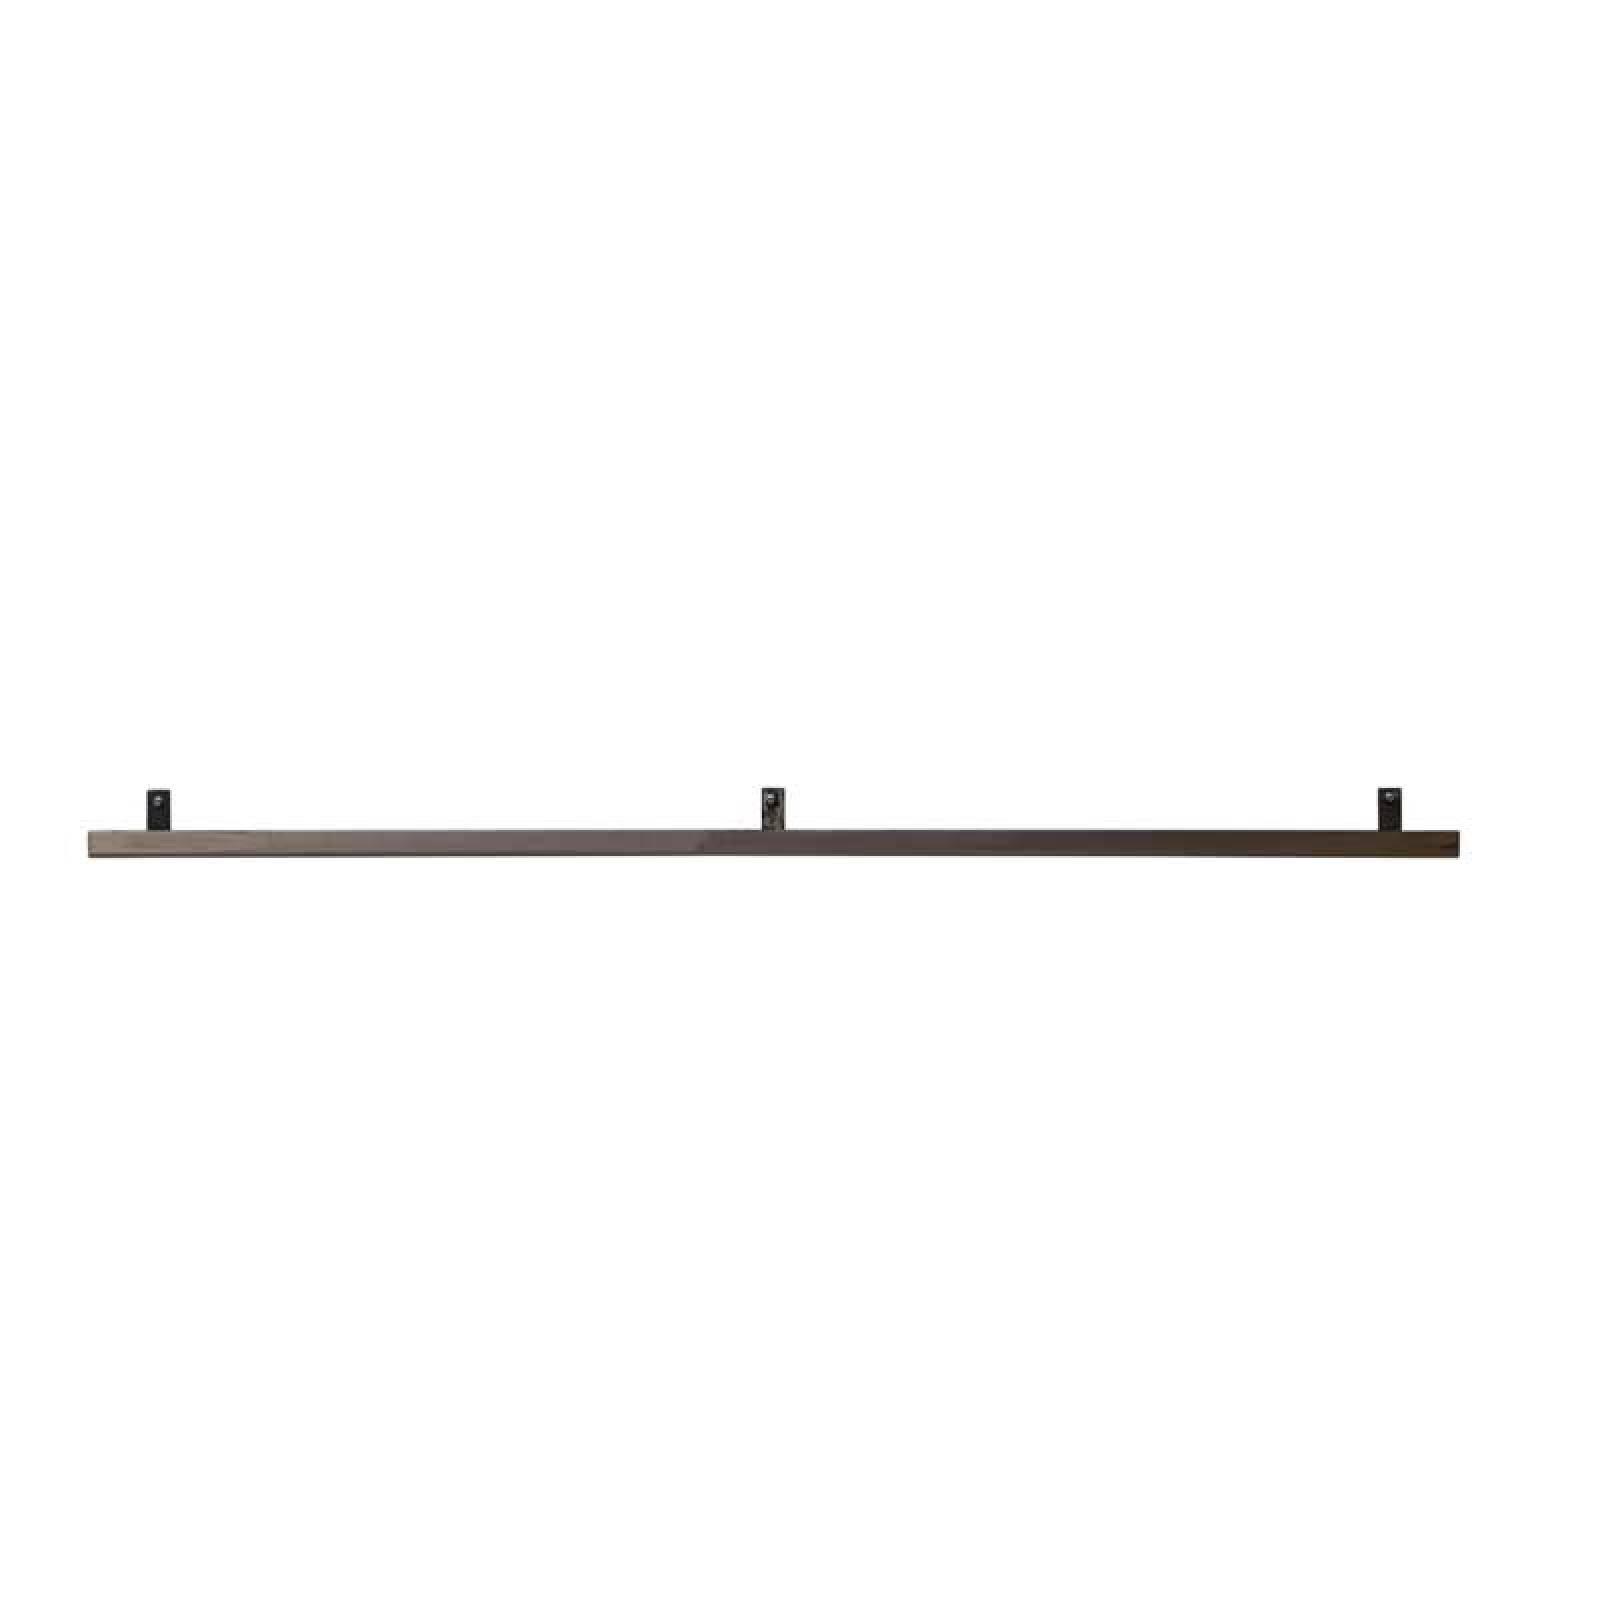 Long Metal Book Shelf Rail 120cm